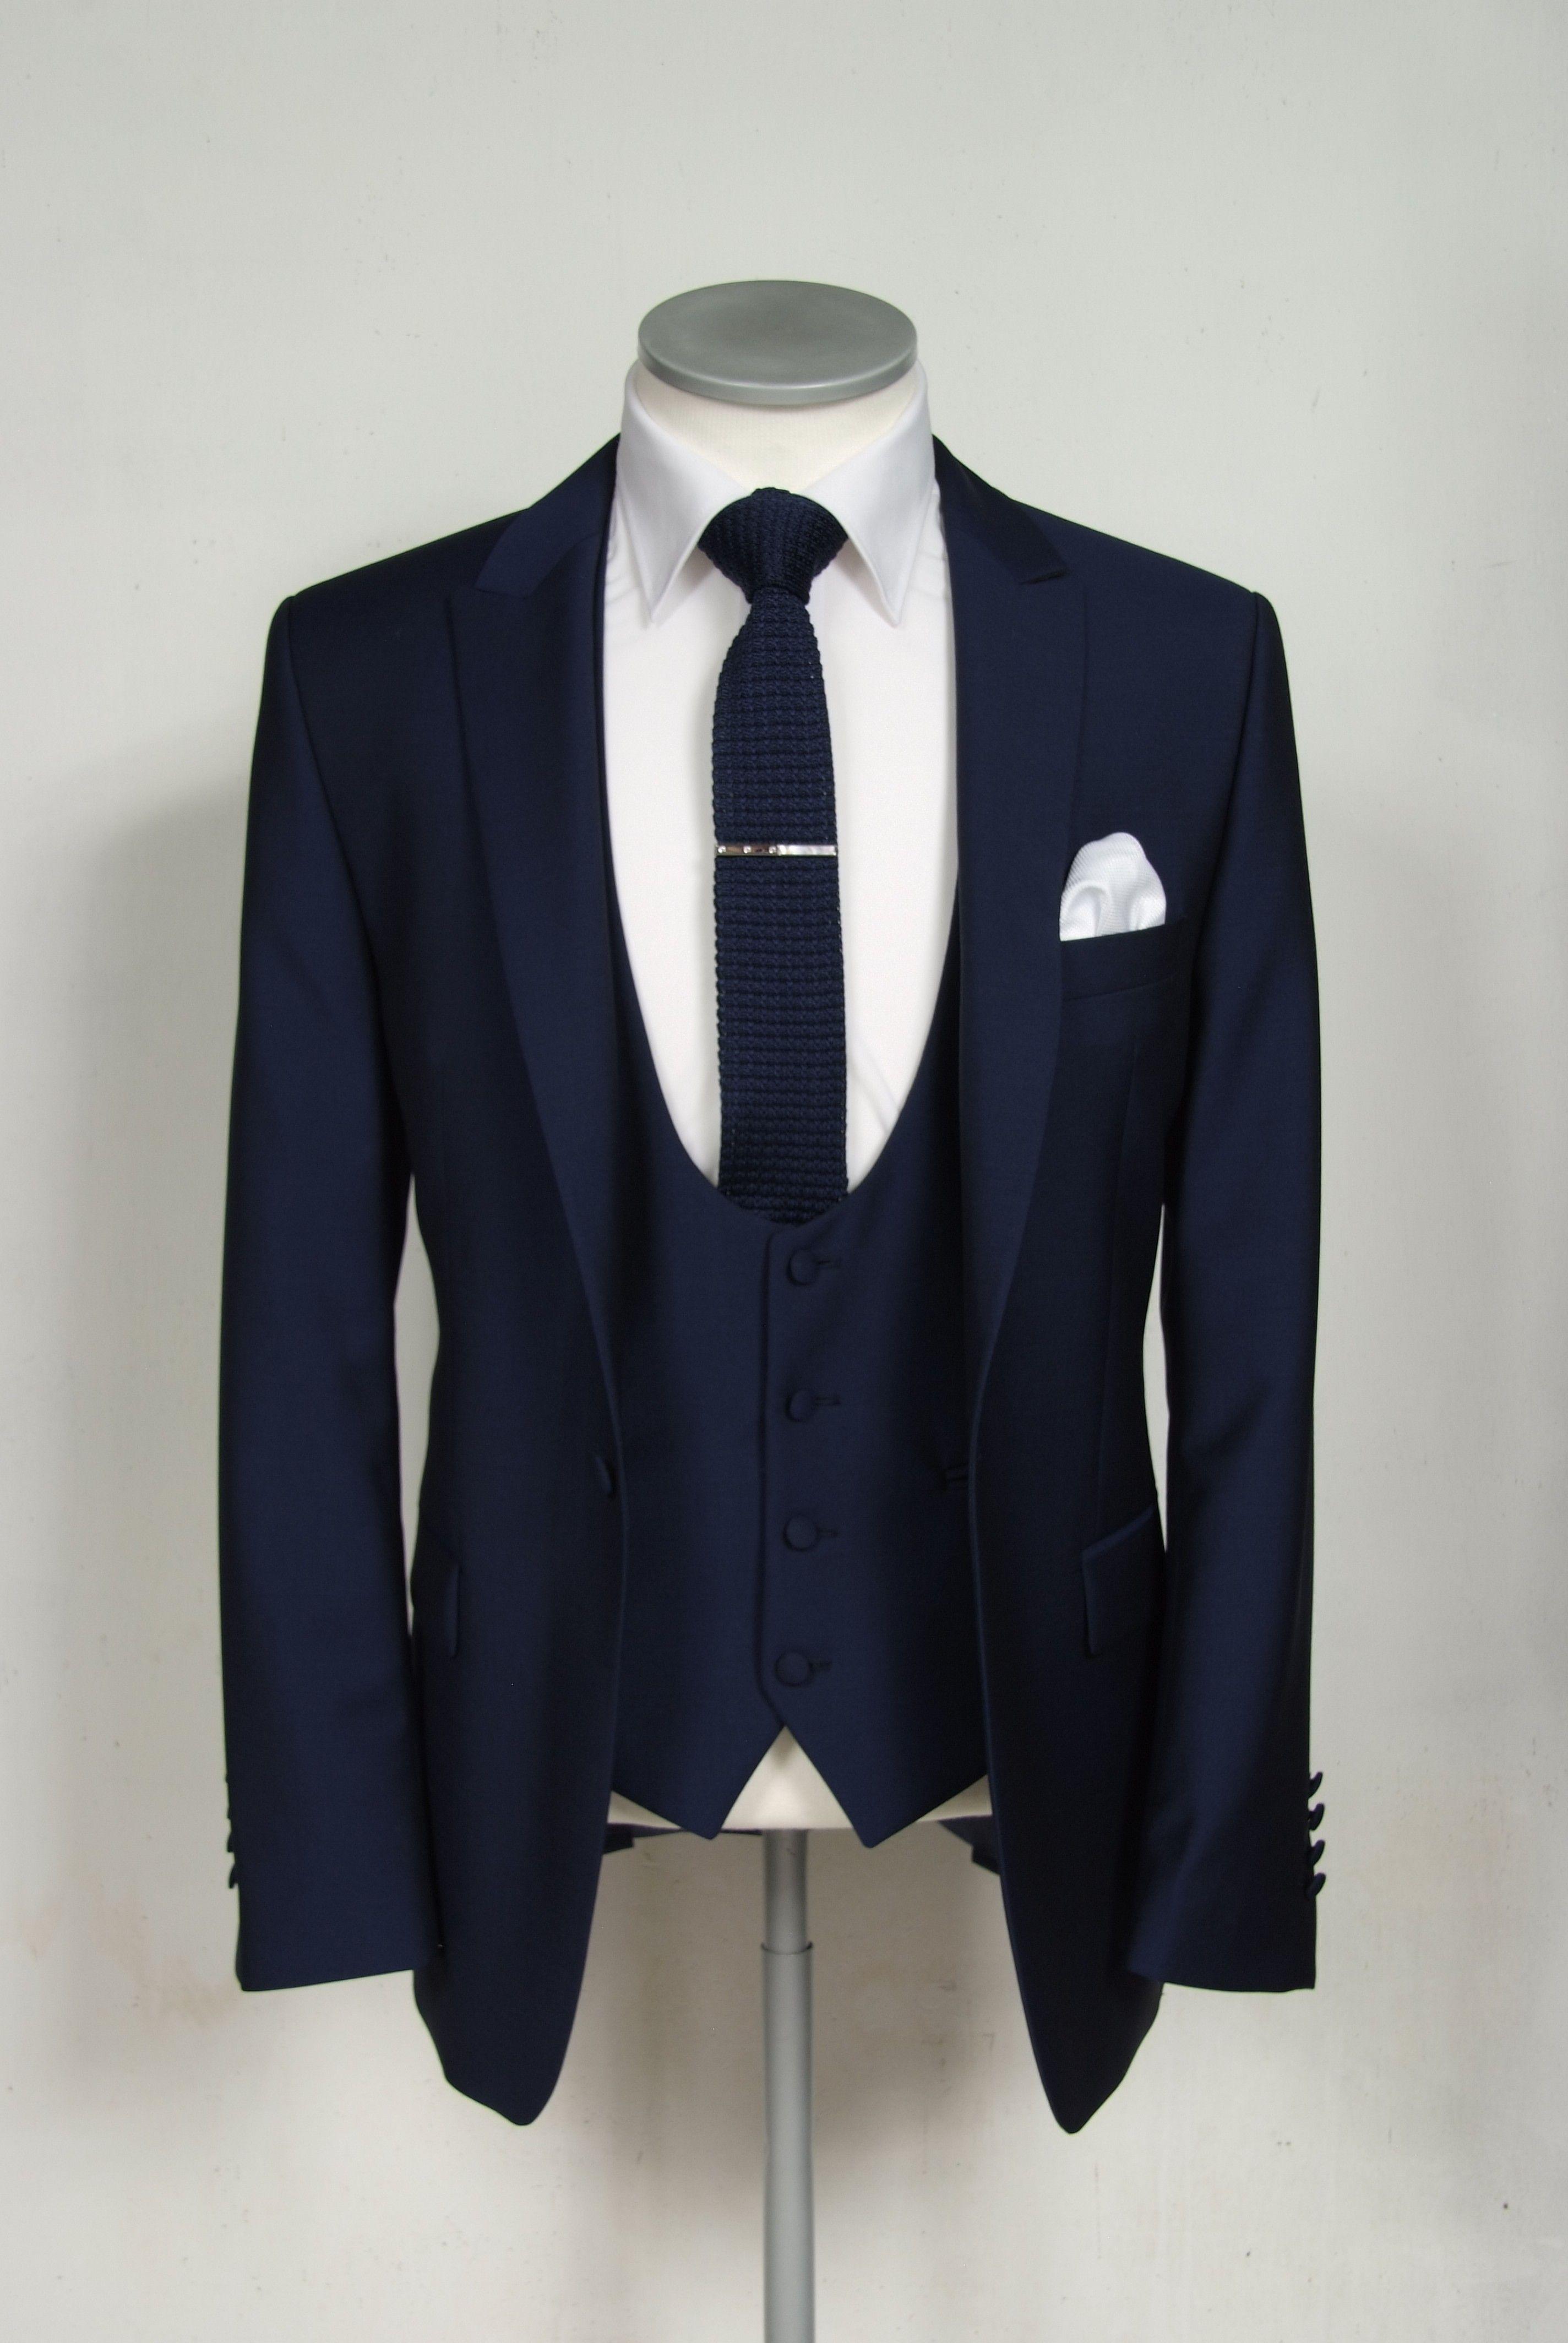 Slim fit silver grey wedding lounge suit Groom tuxedo